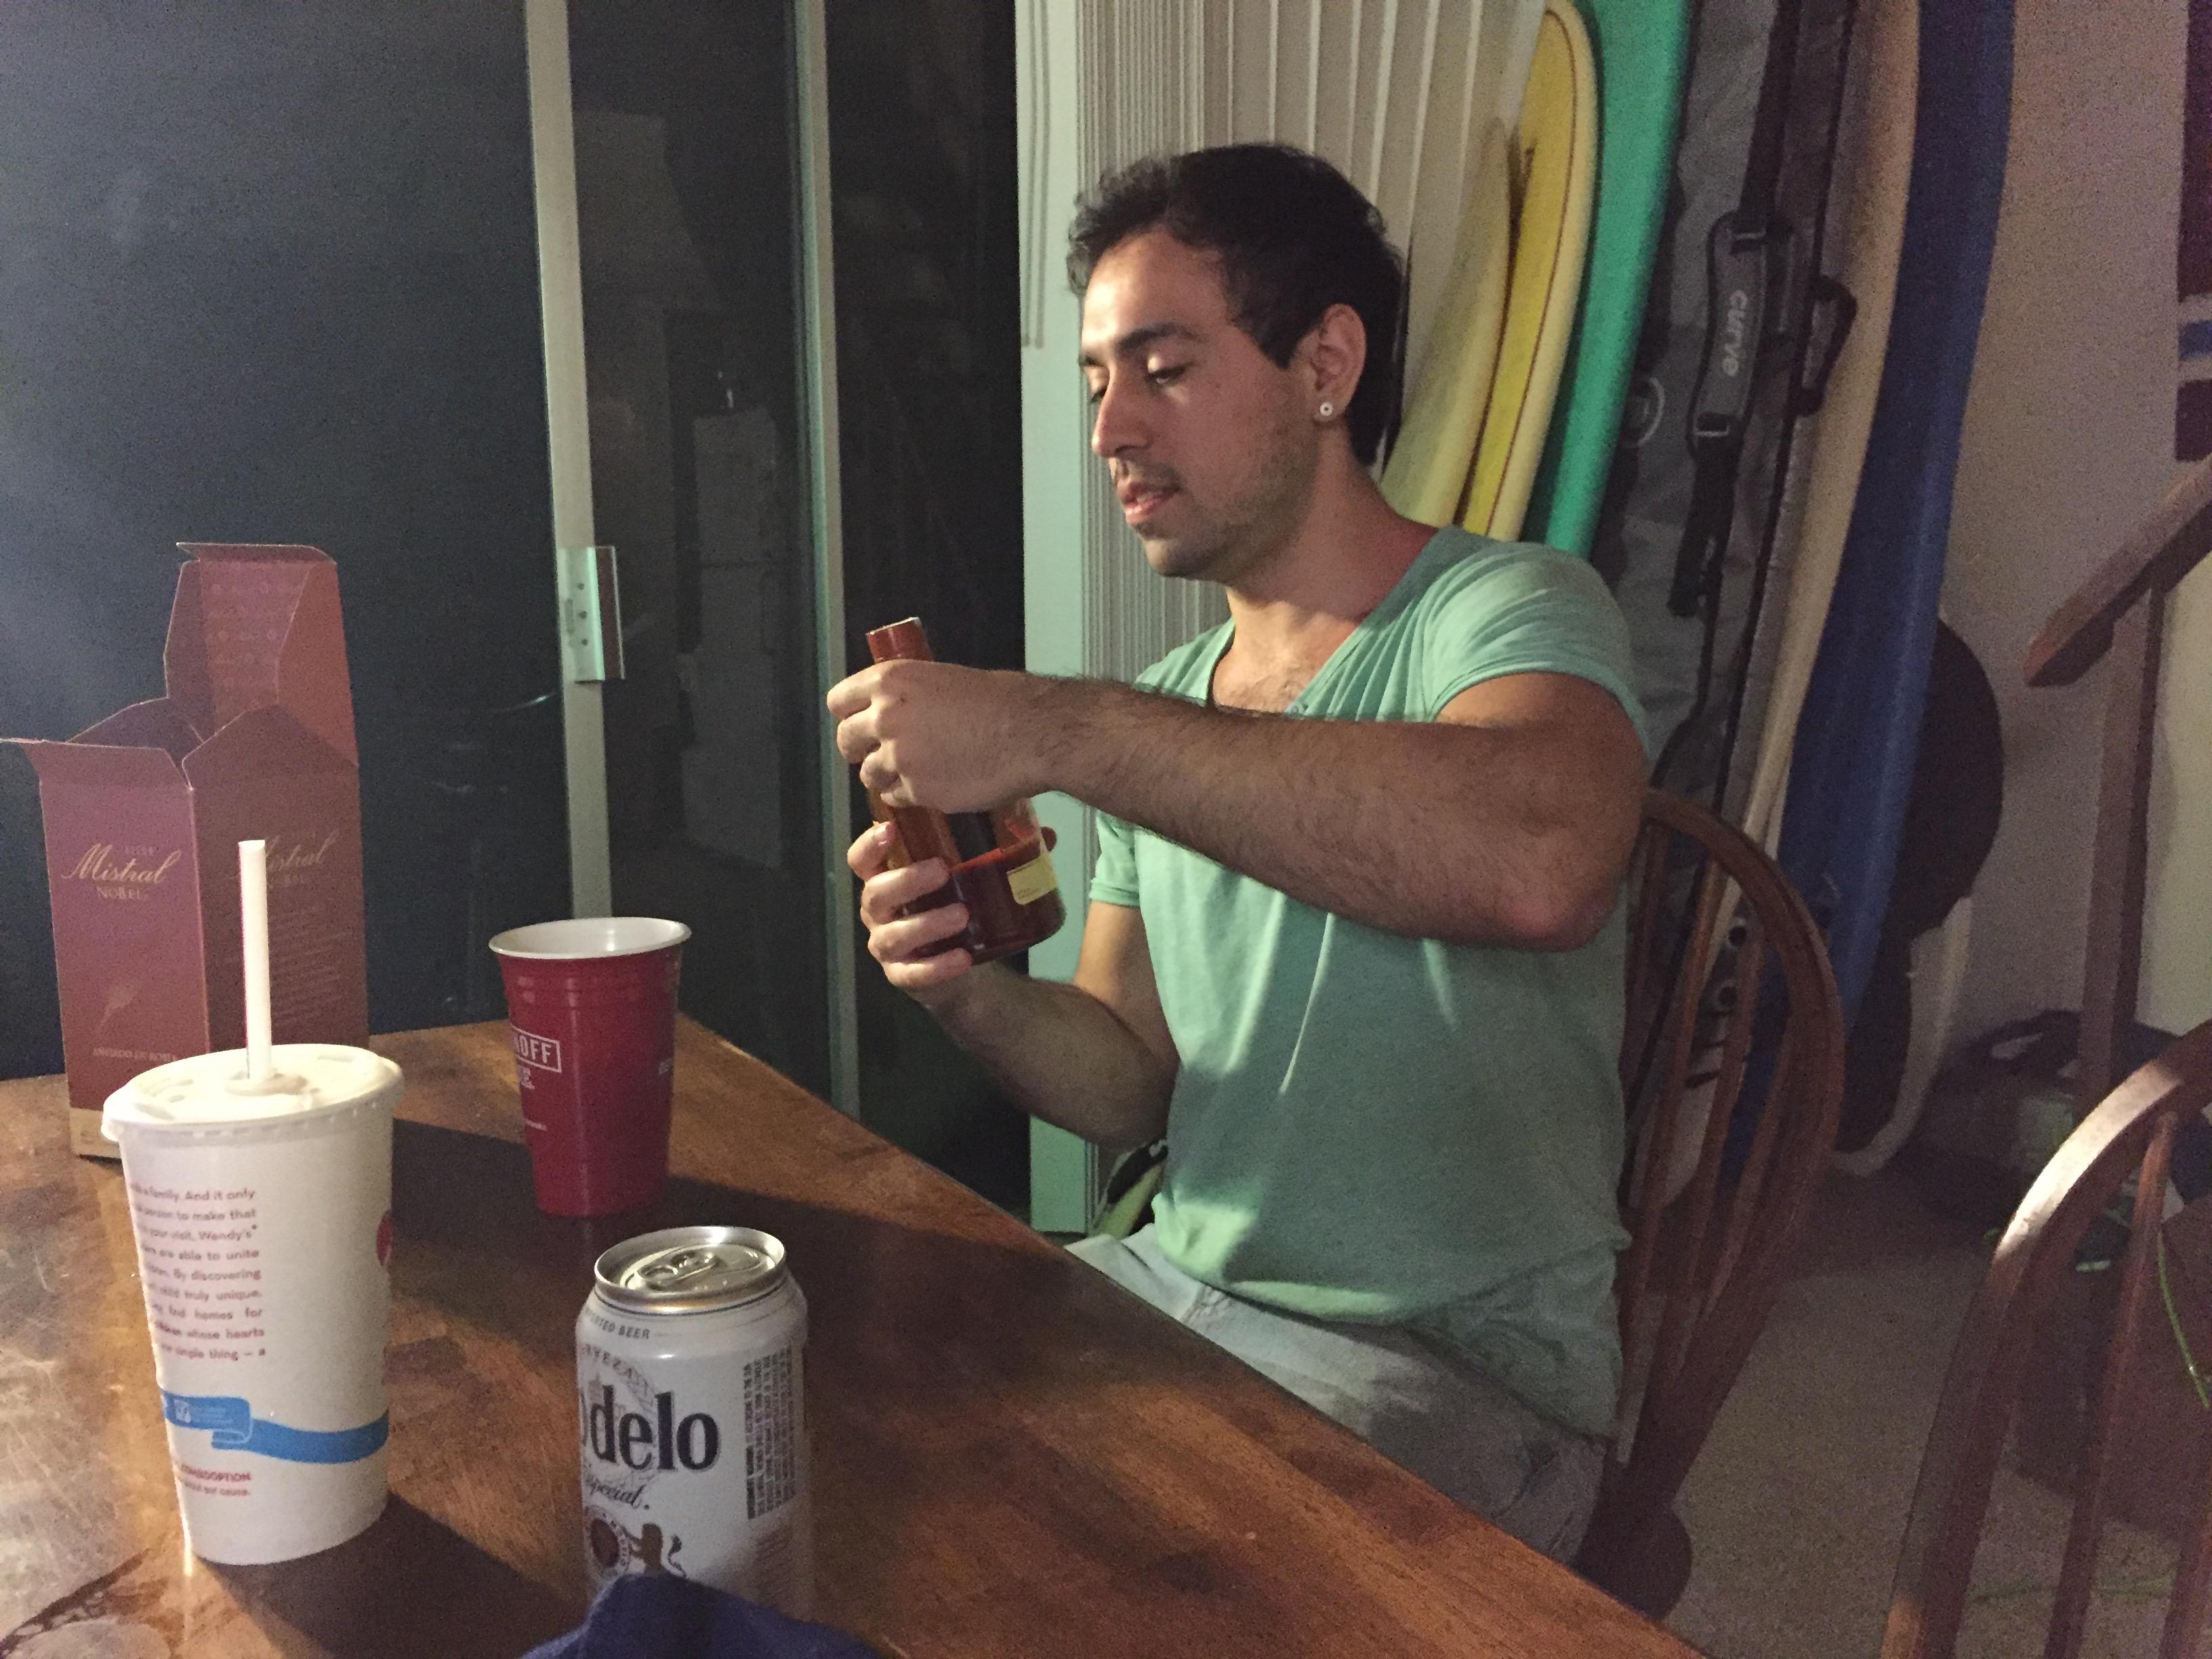 A Chilean opens a bottle of pisco.